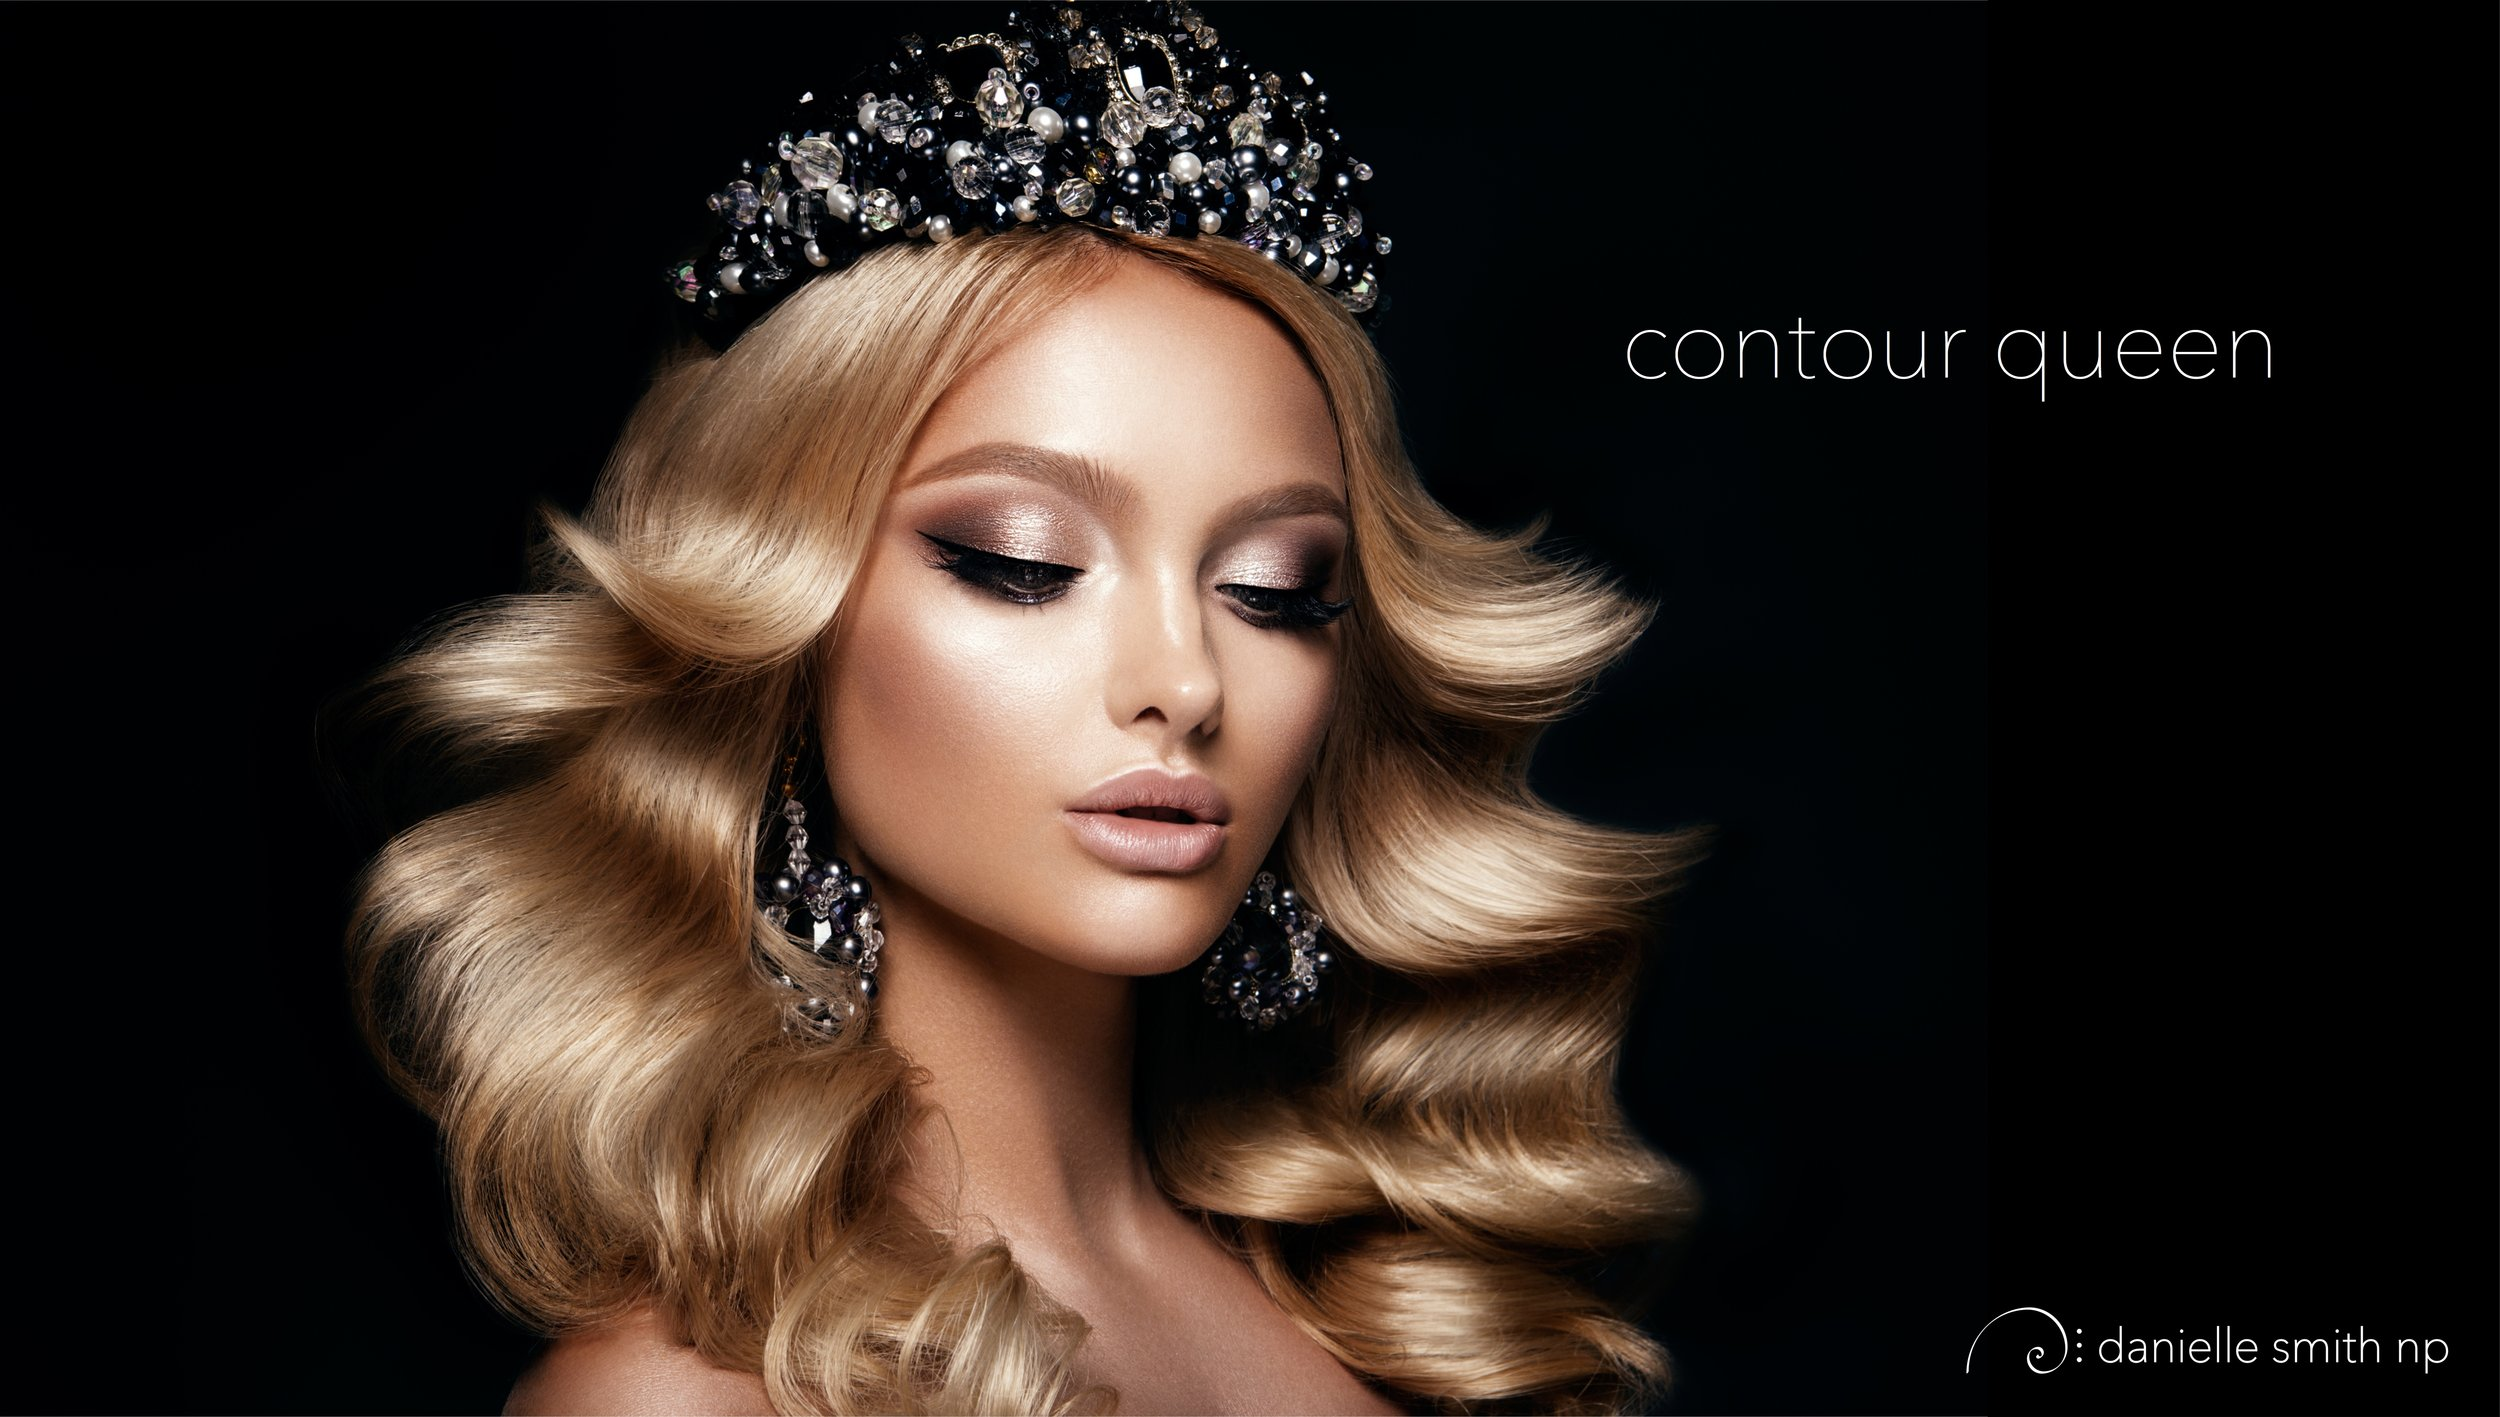 contour queen.jpg